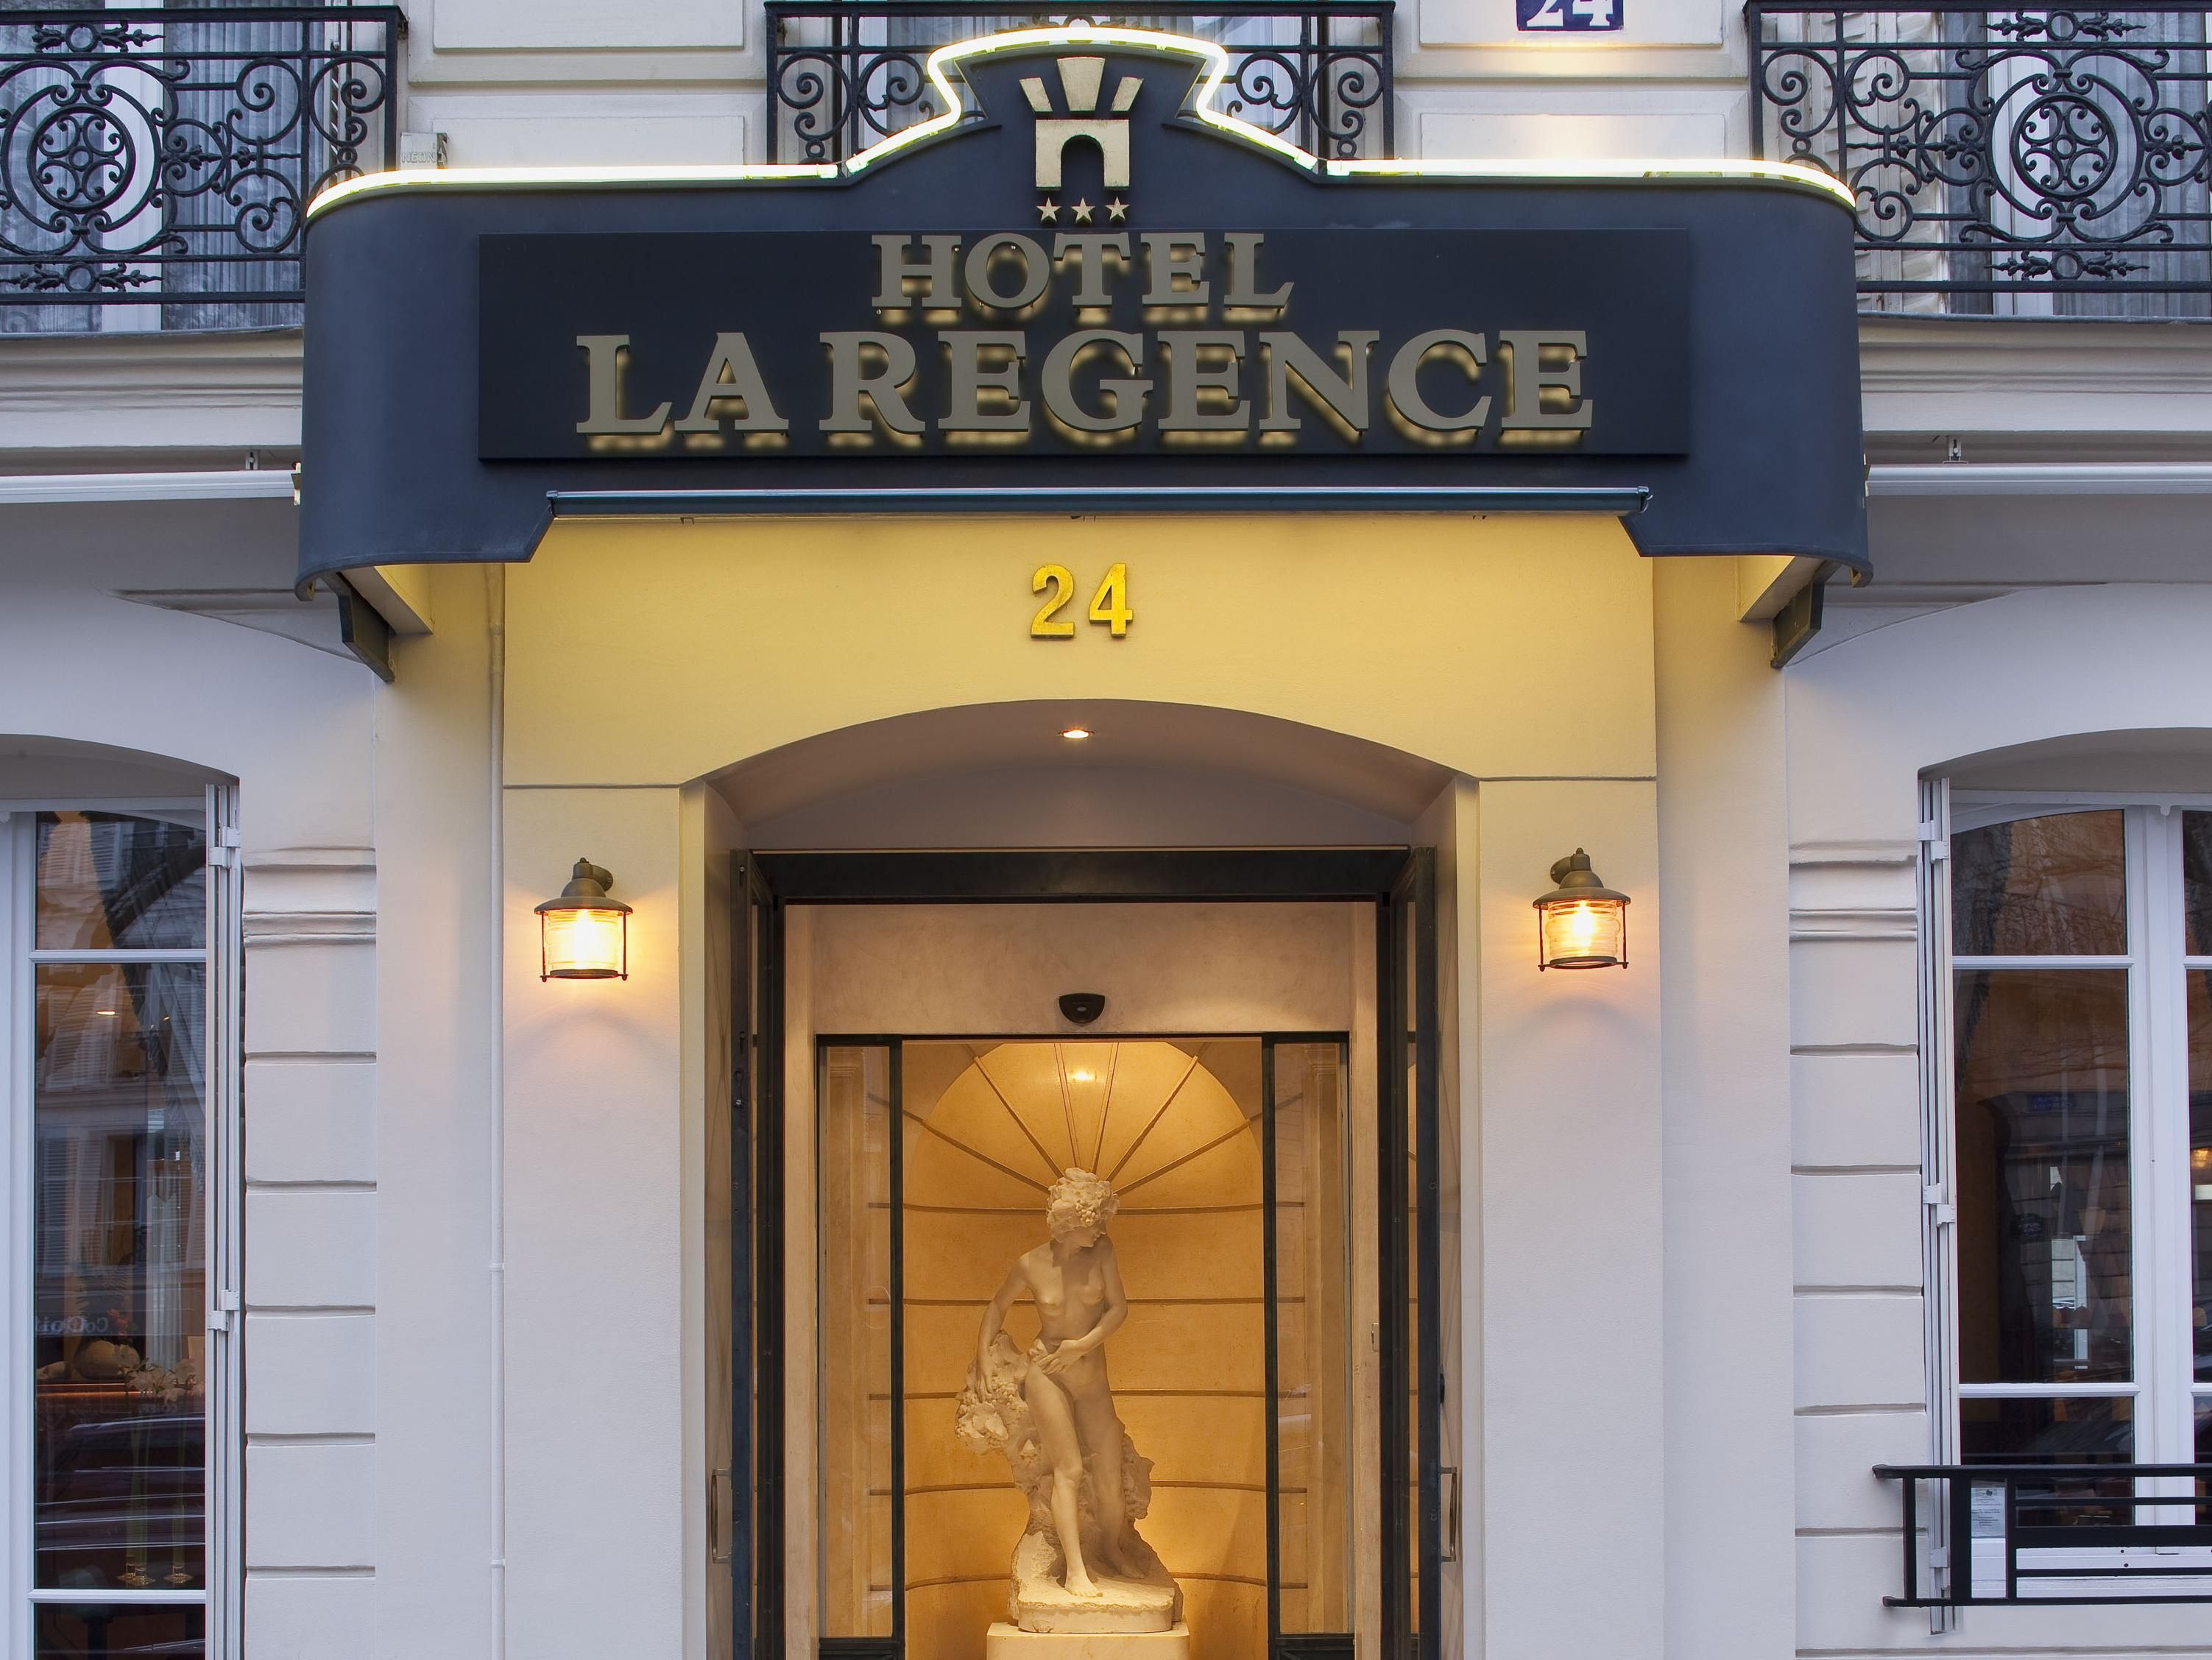 Paris La Regence Etoile Hotel France Europe The 3 Star